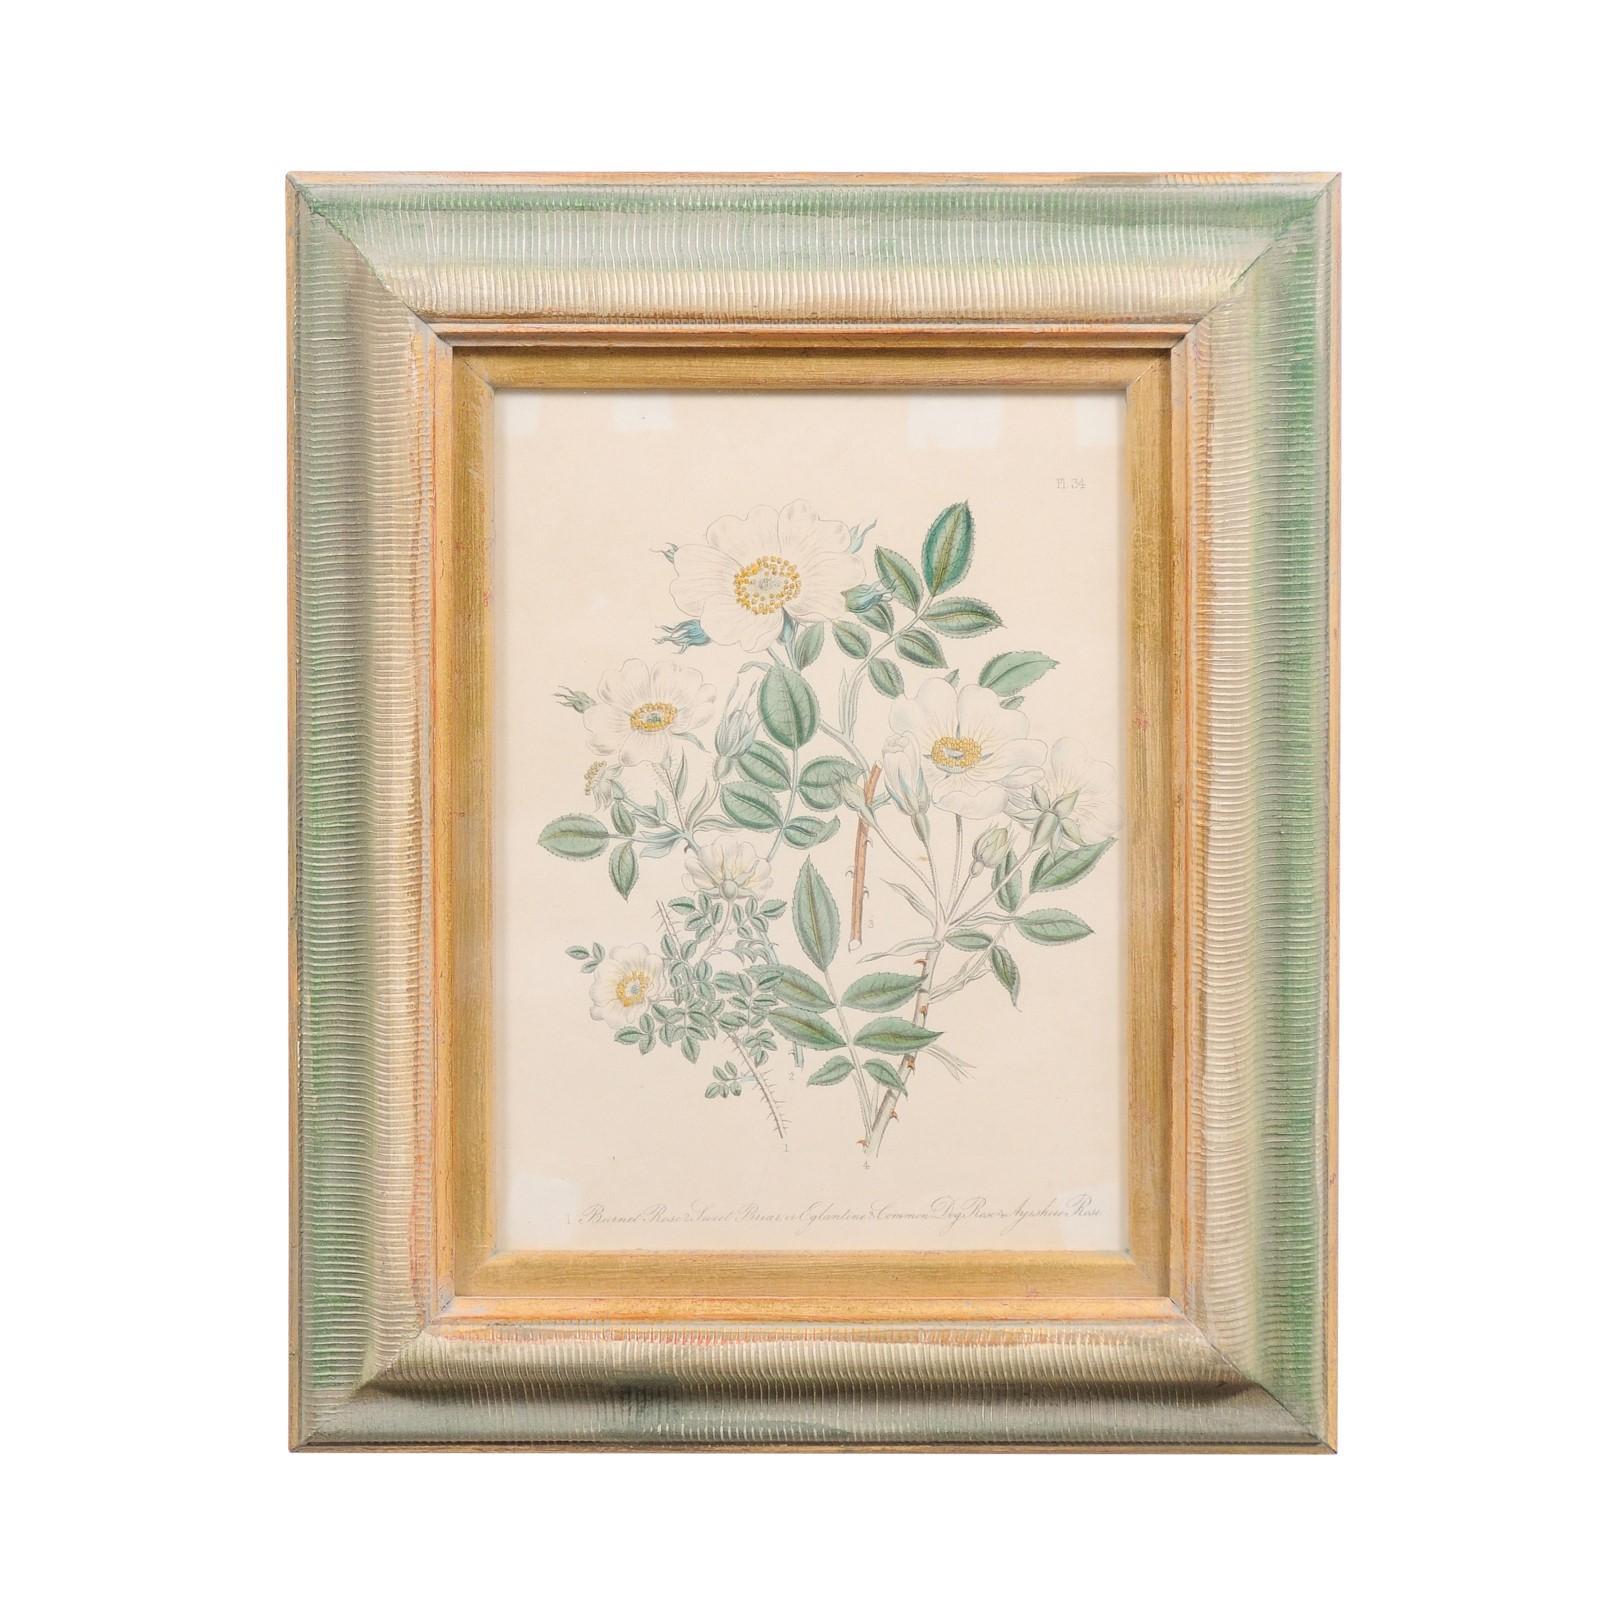 English 19th Century Victorian Framed Print Depicting White Eglantine Roses